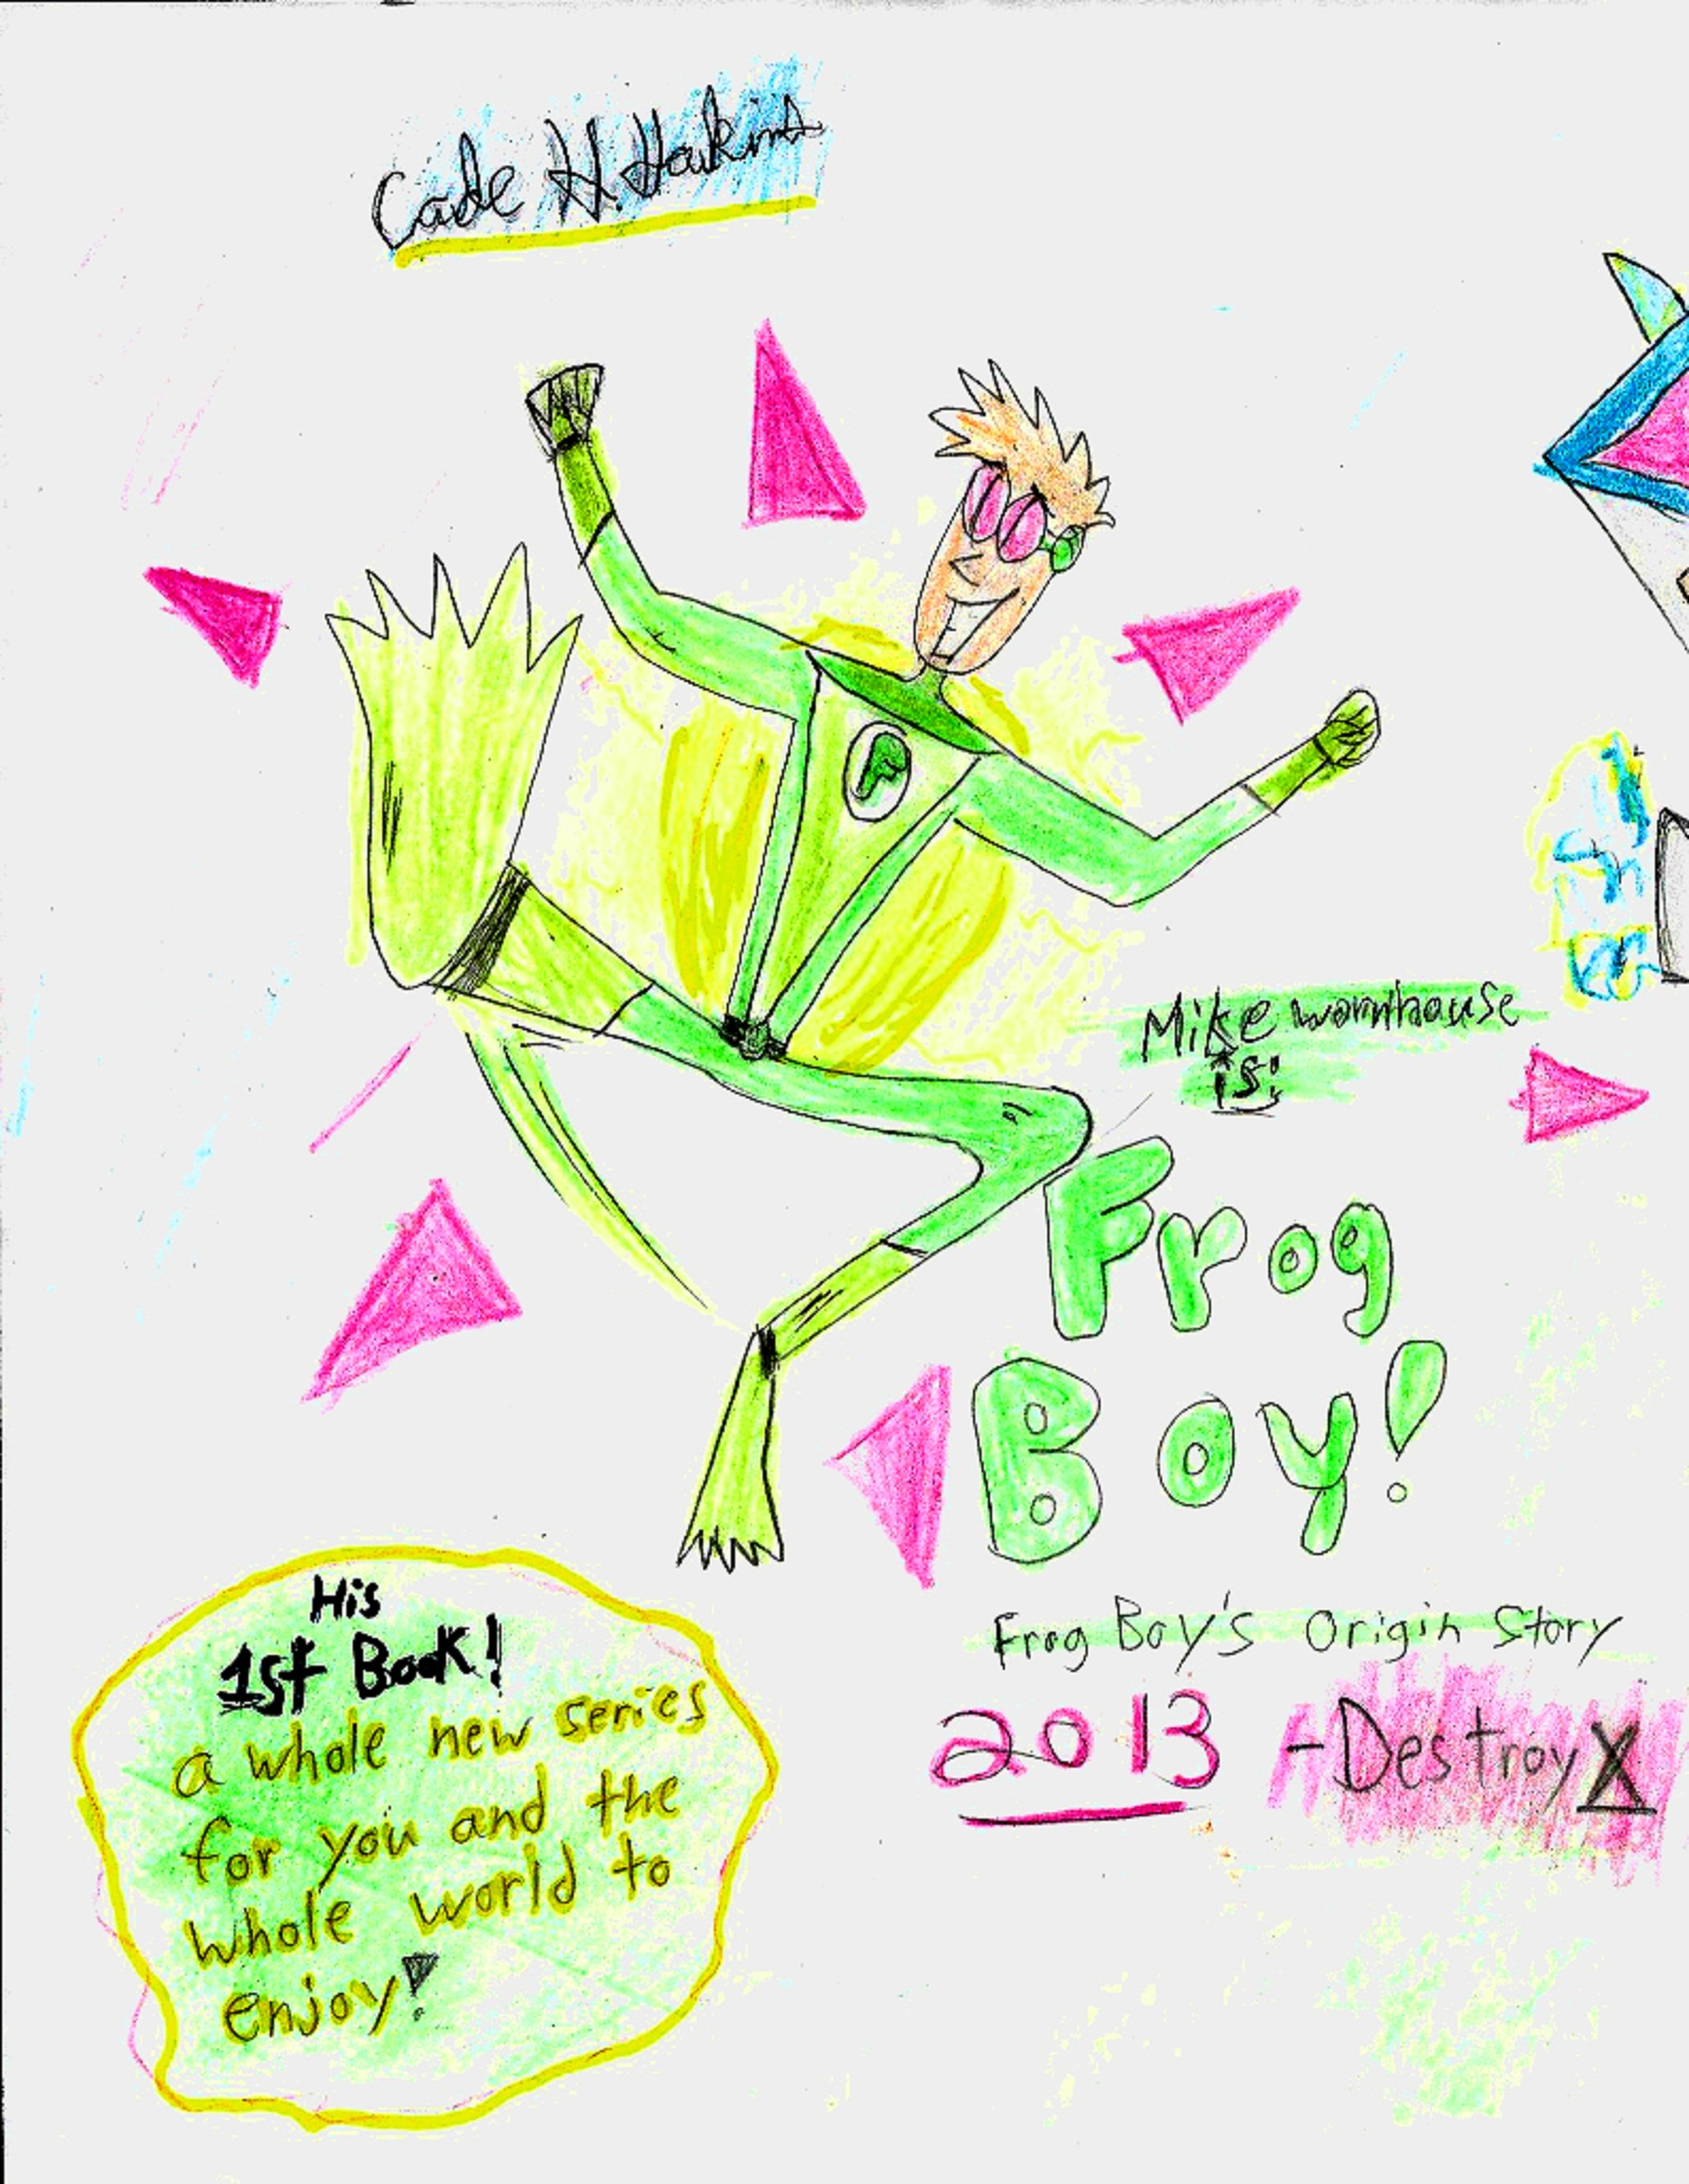 Frog Boy-Frog Boy's Origin story